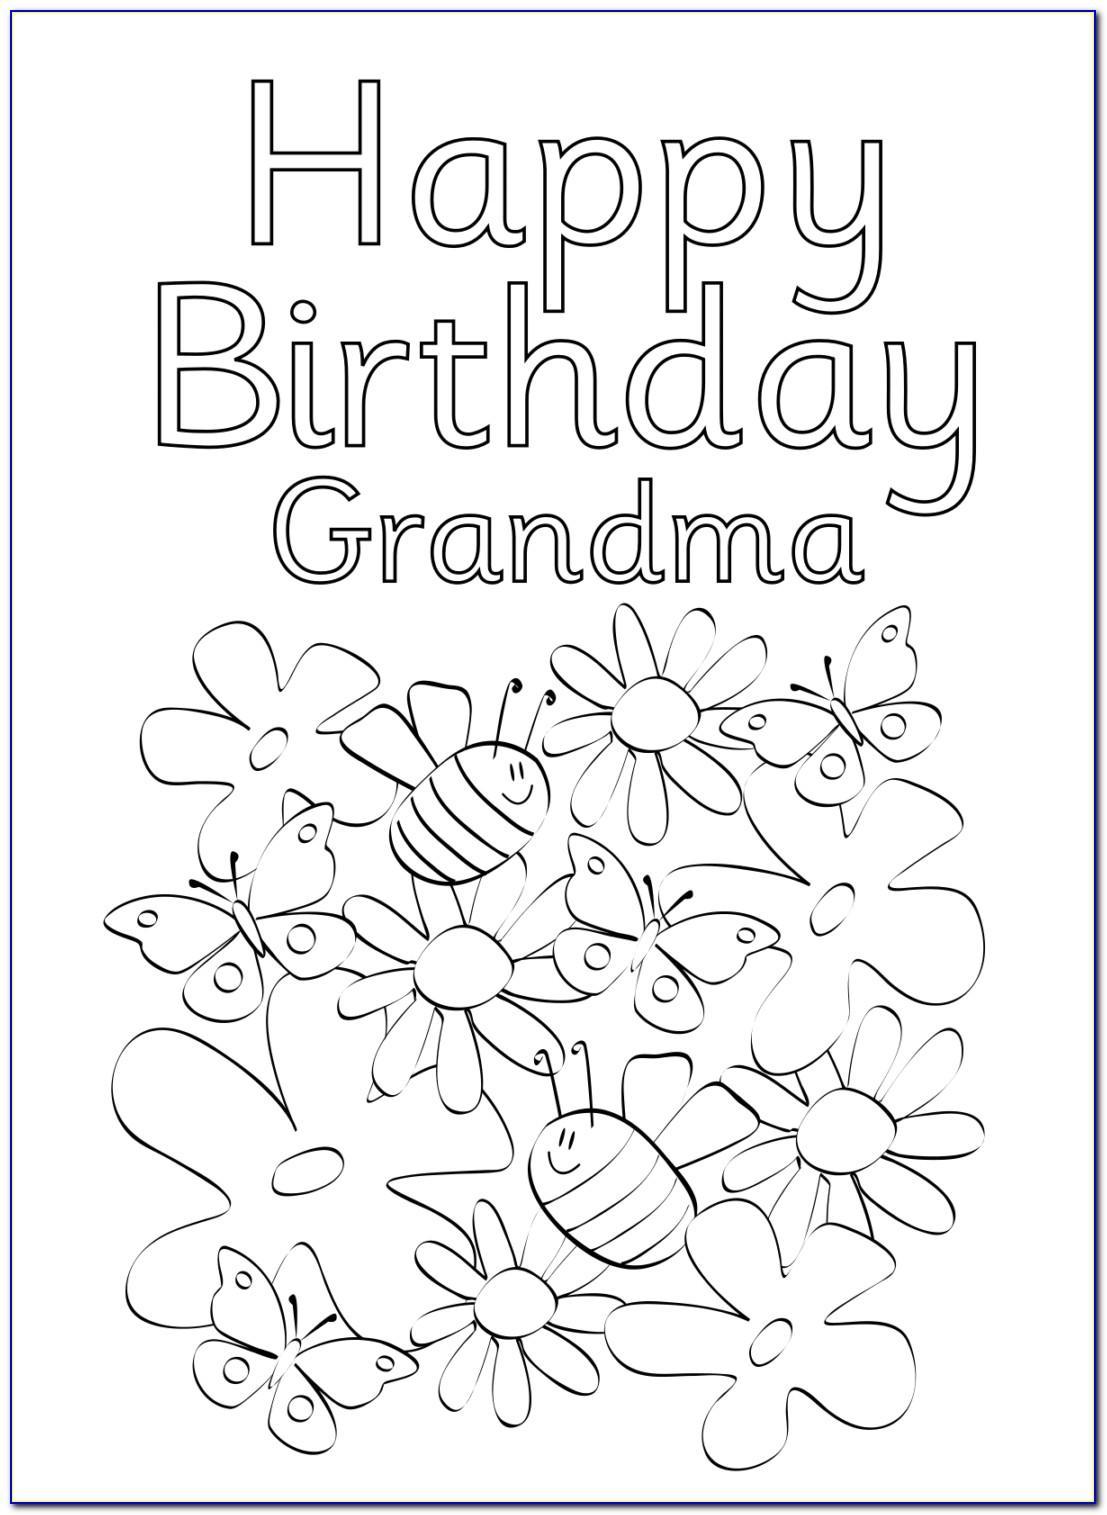 Free Printable Birthday Cards For Grandma To Color